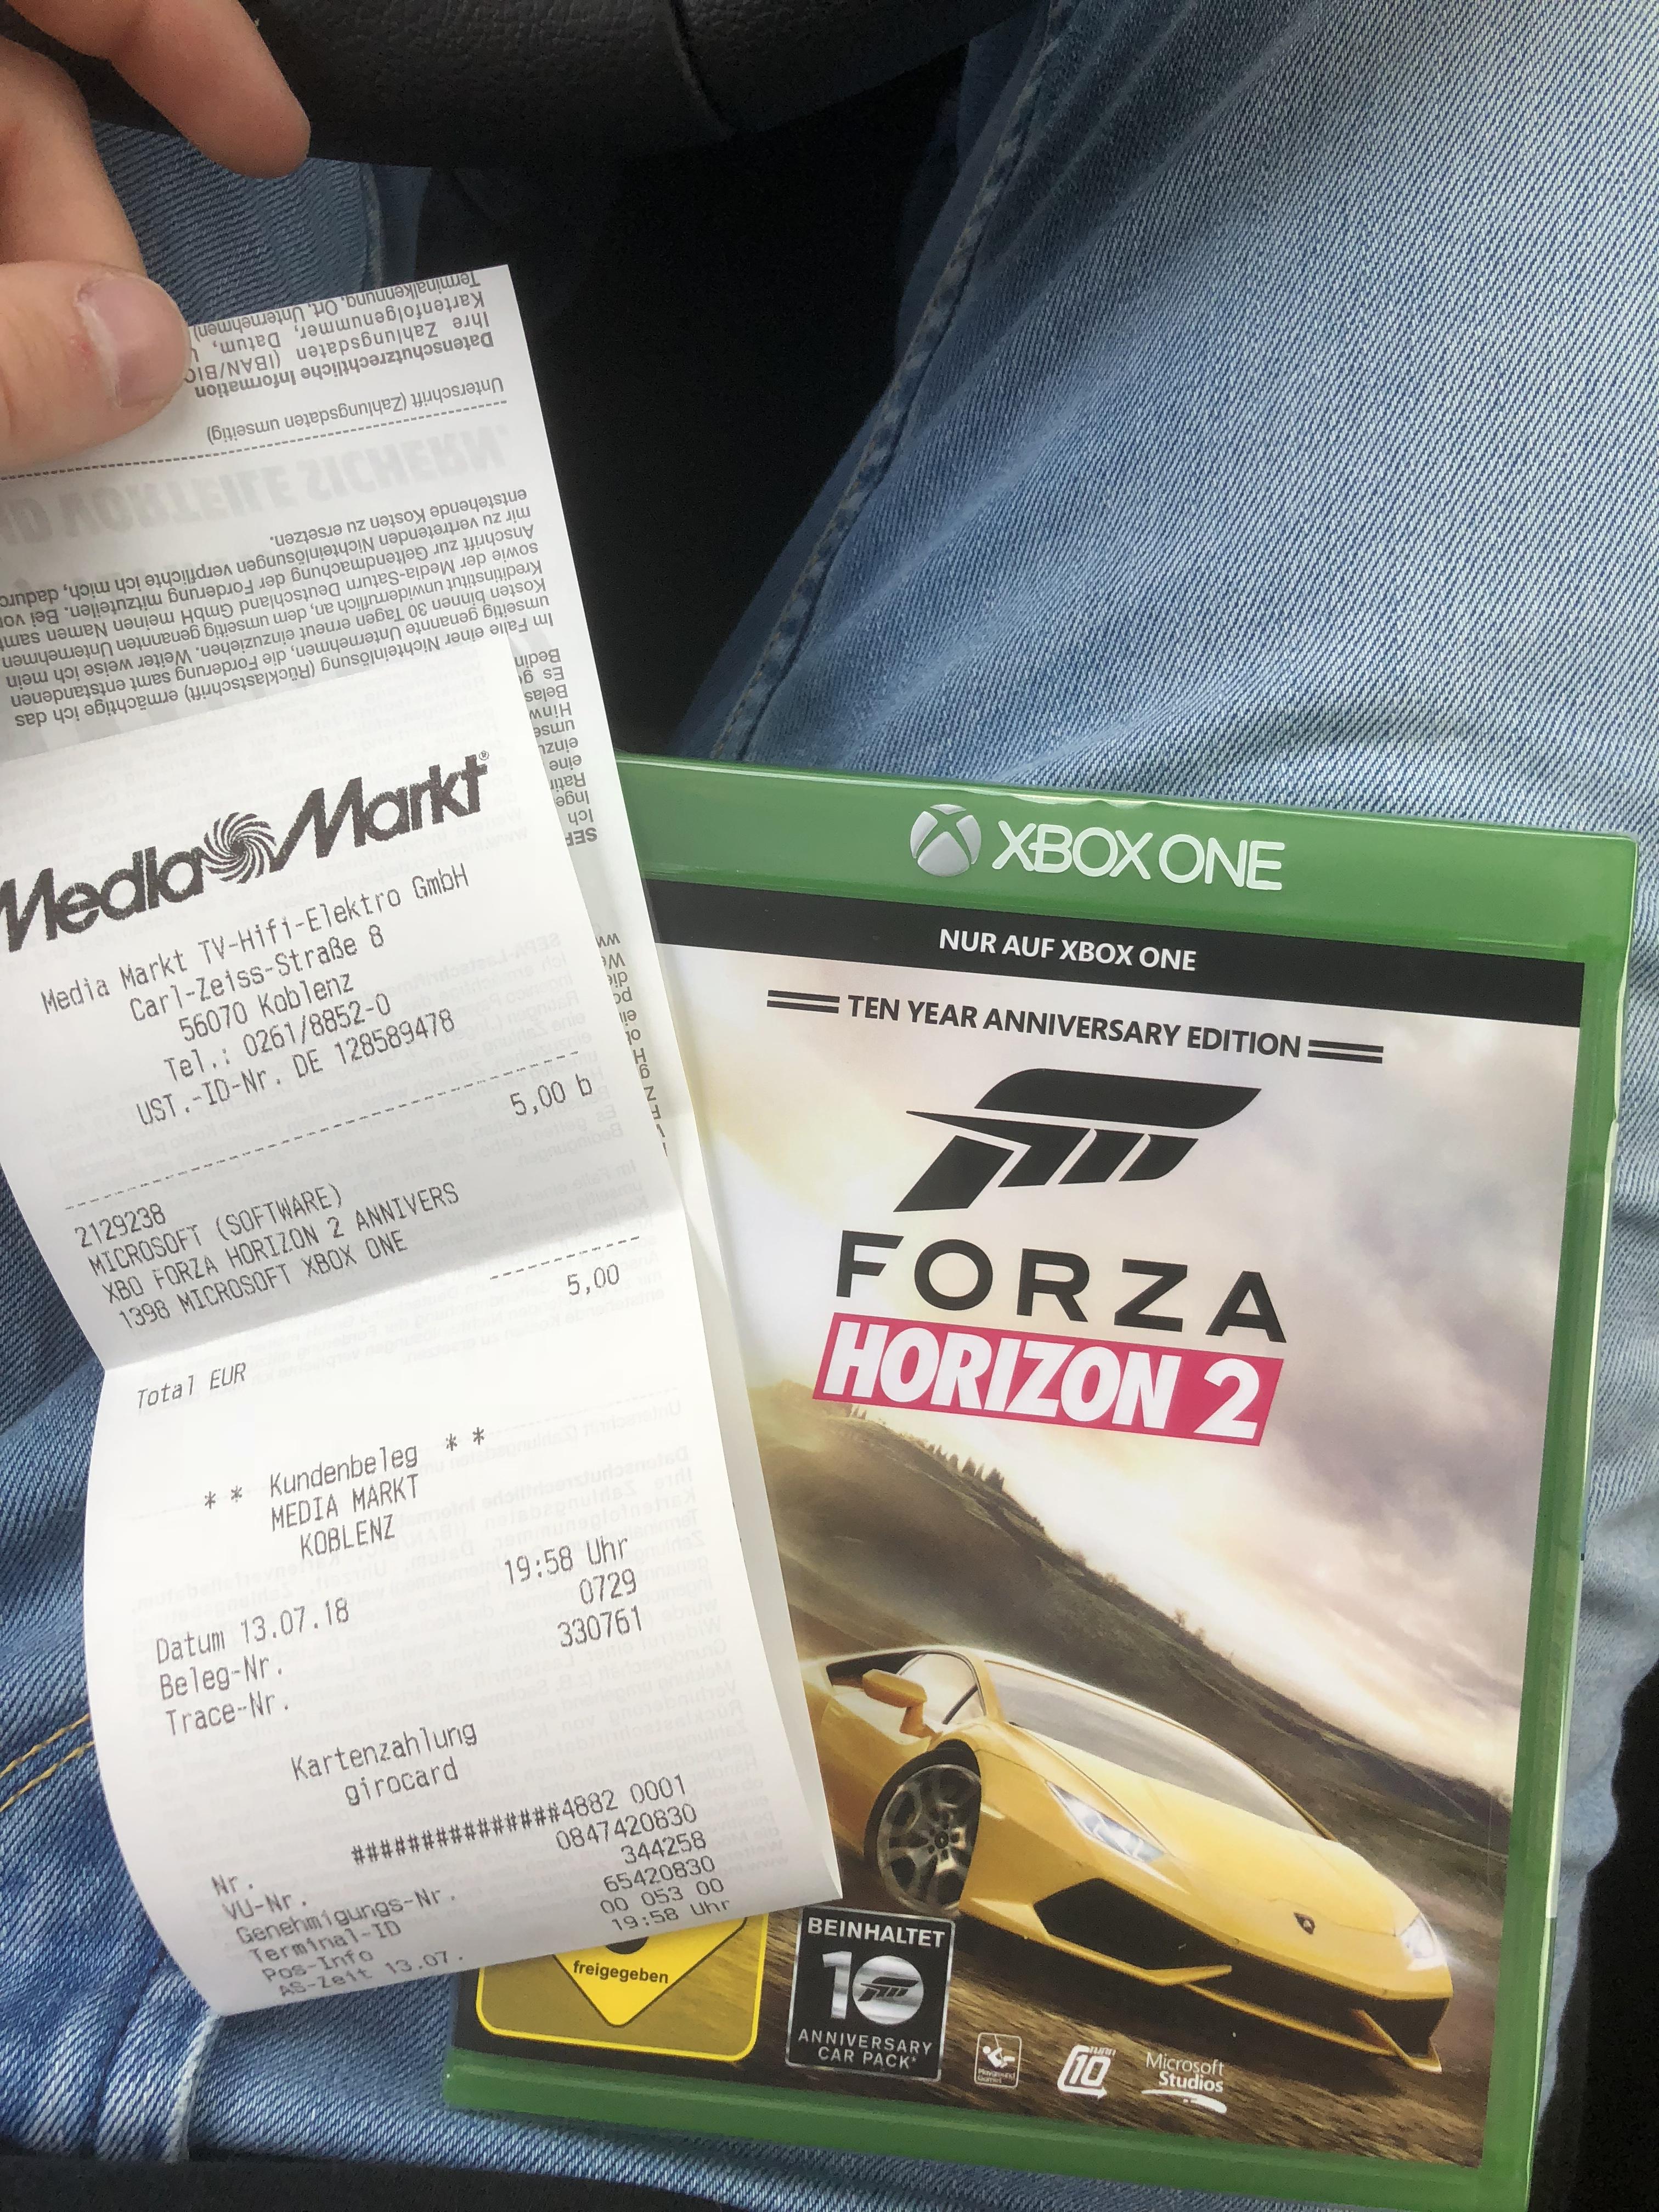 (Lokal) MediaMarkt Koblenz Forza Horizon 2